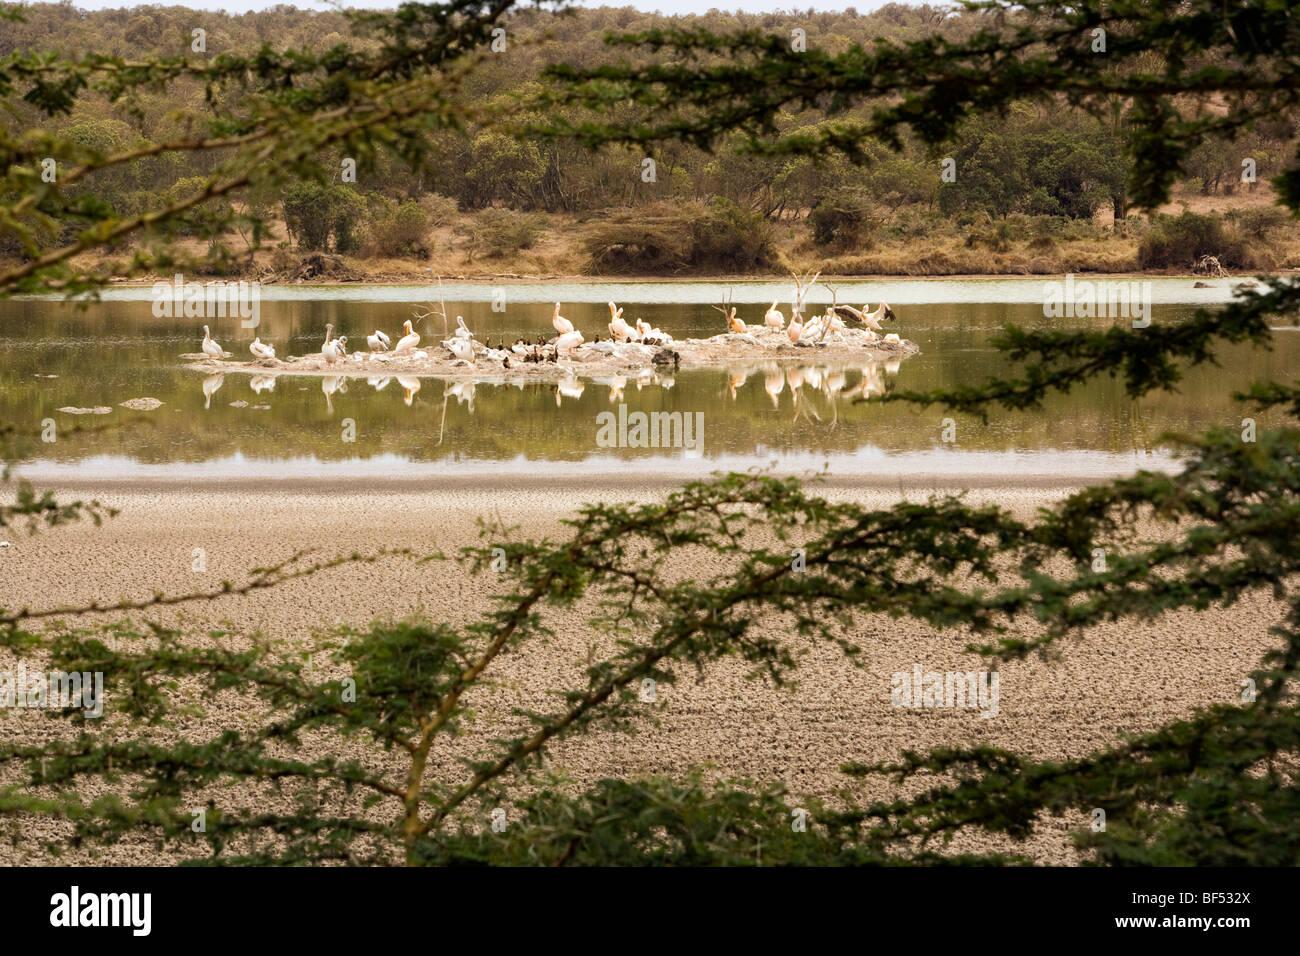 Great White Pelicans at Lake Sangare, Kenya - Stock Image